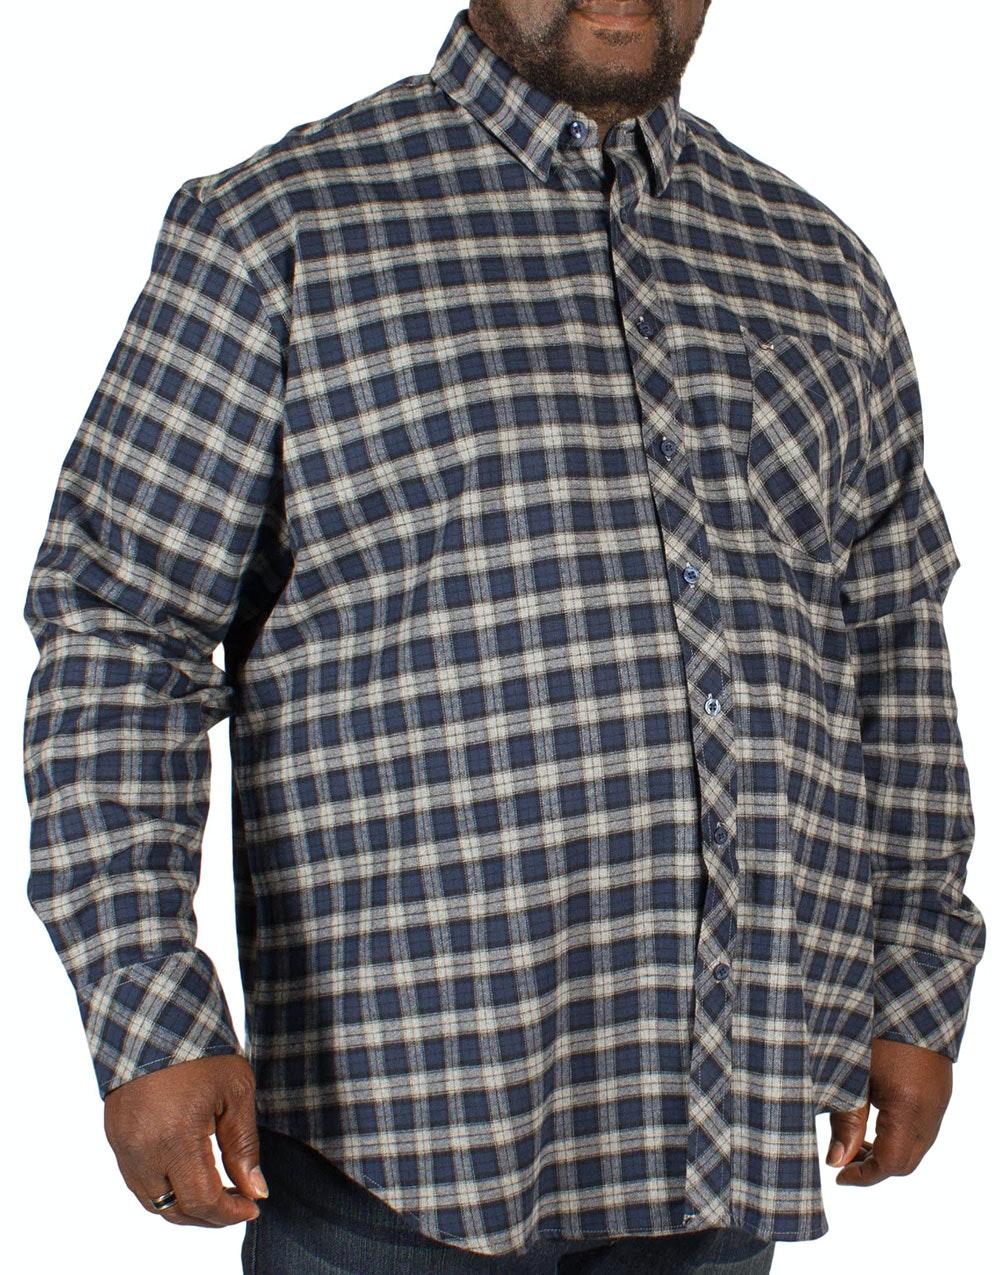 Peter Gribby Long Sleeve Brushed Check Shirt Indigo